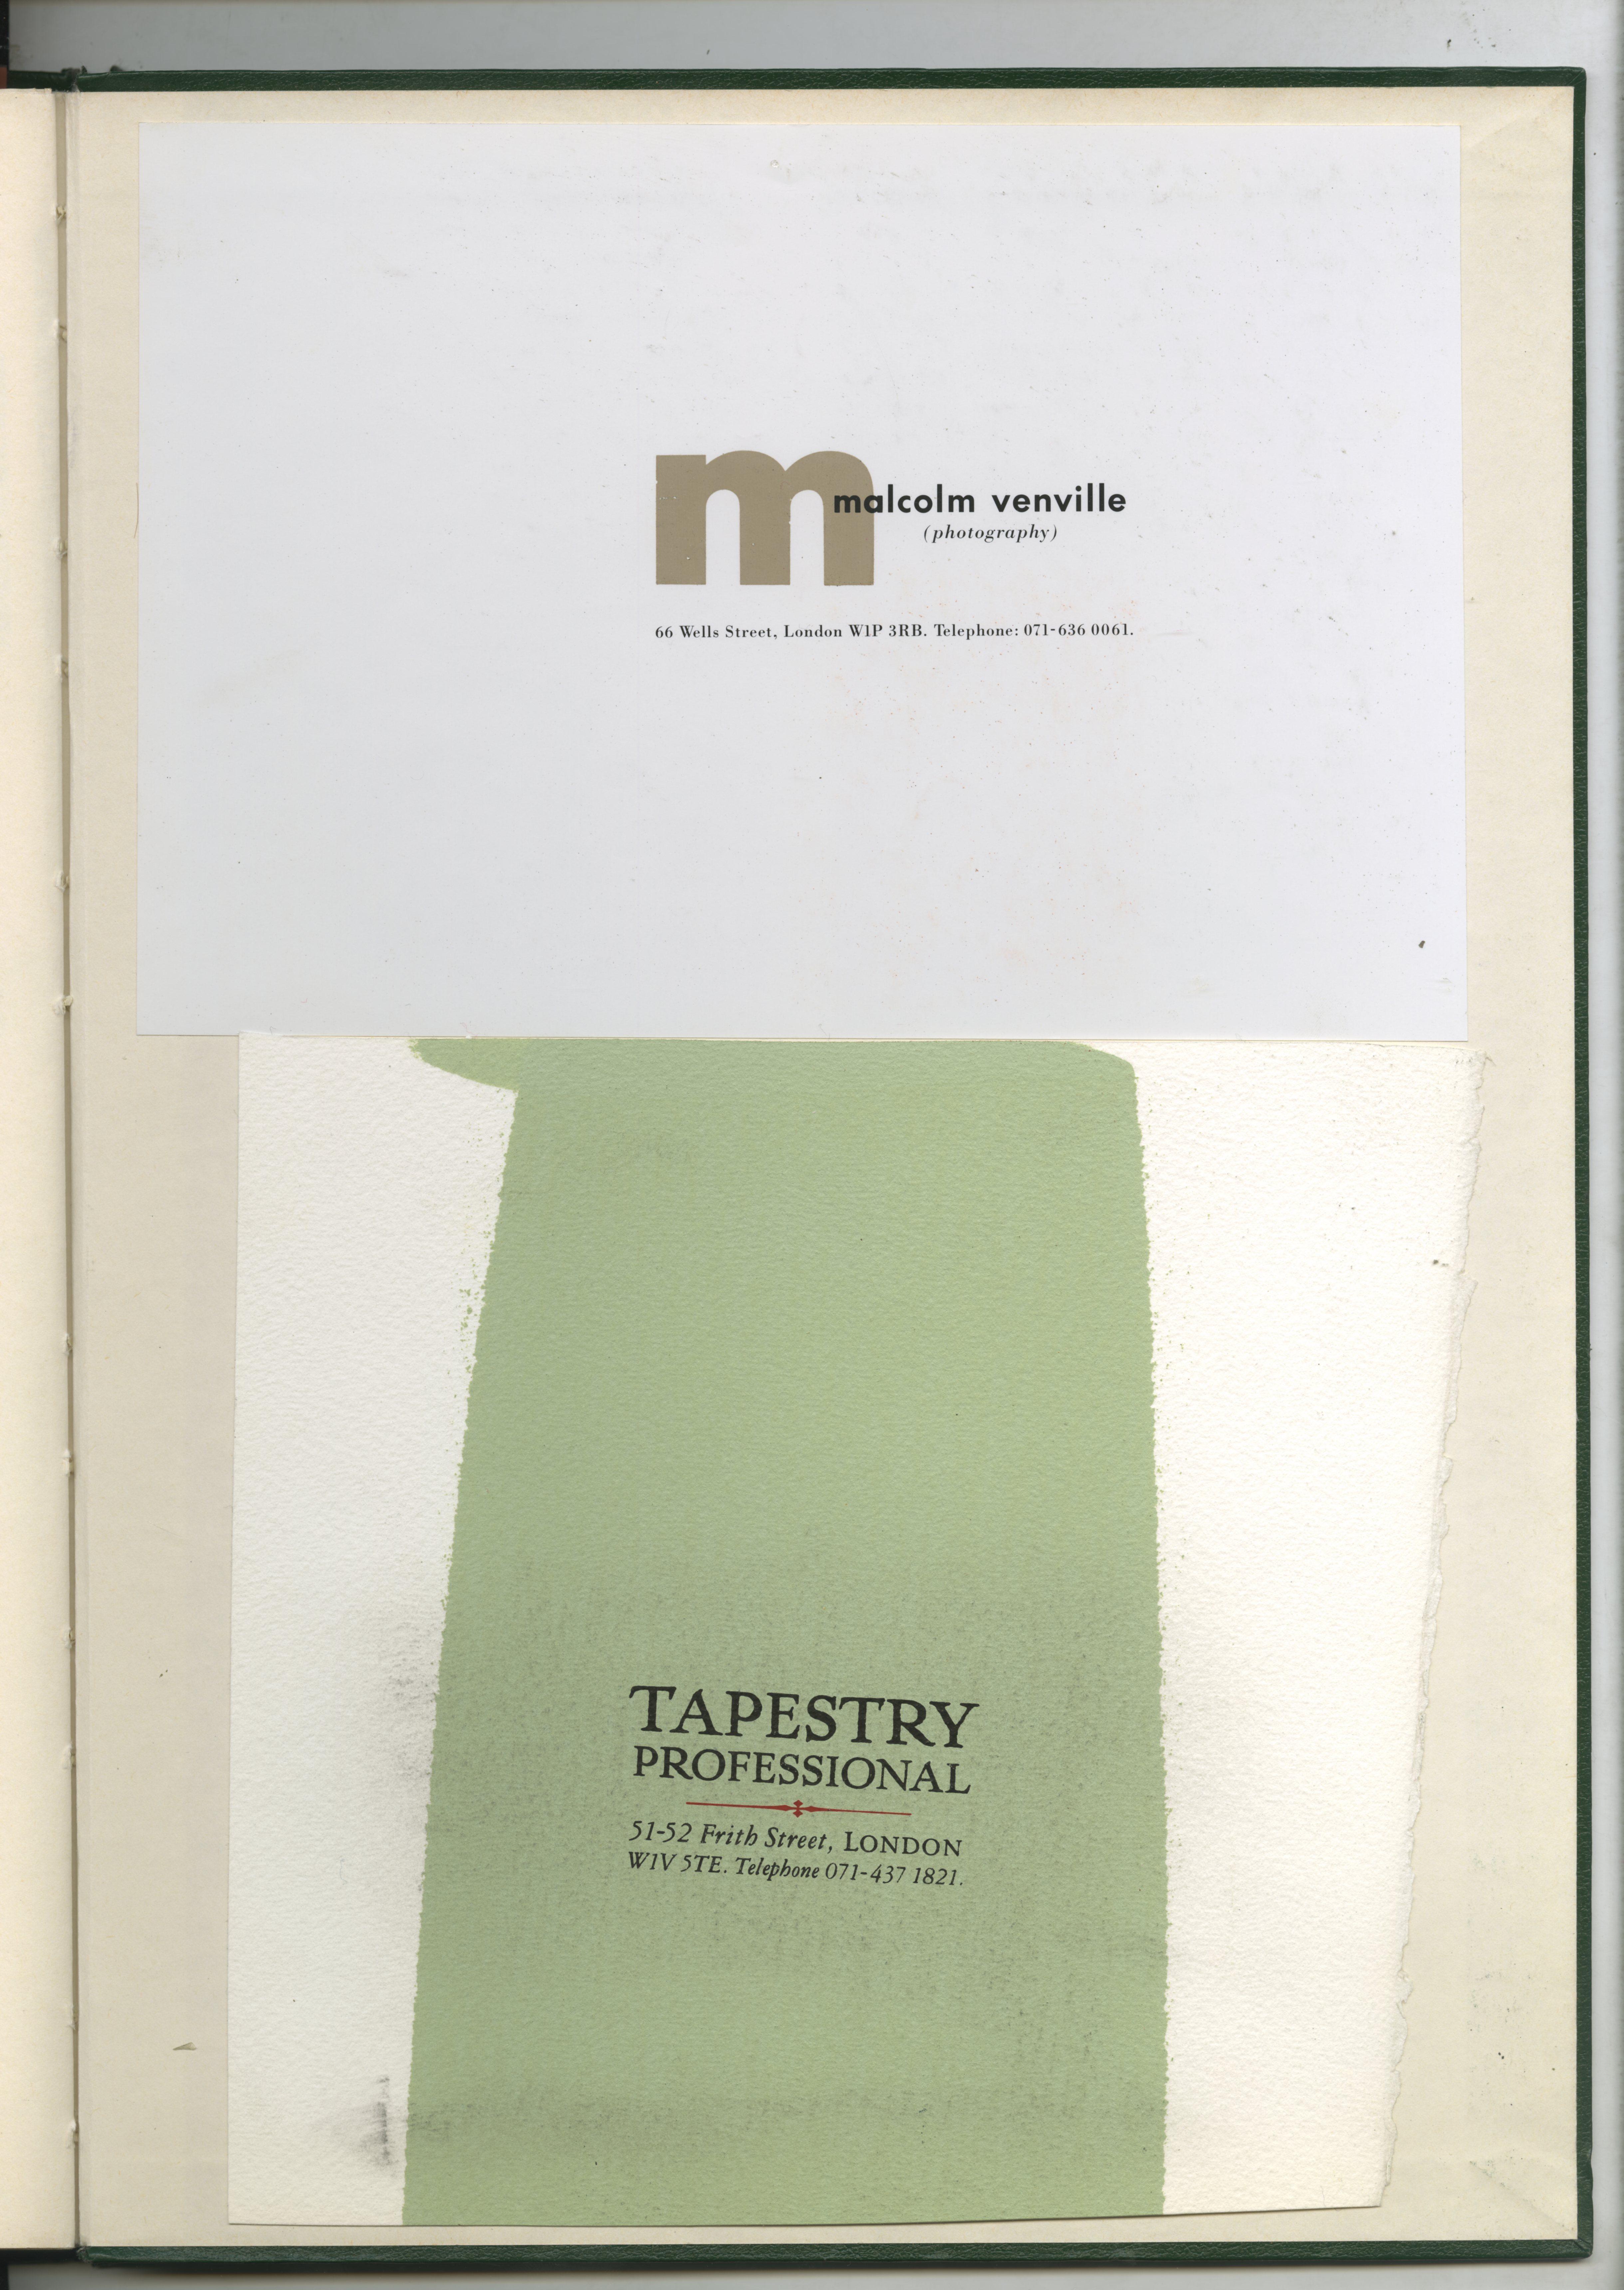 93. GREEN BOOKS: 'Type'